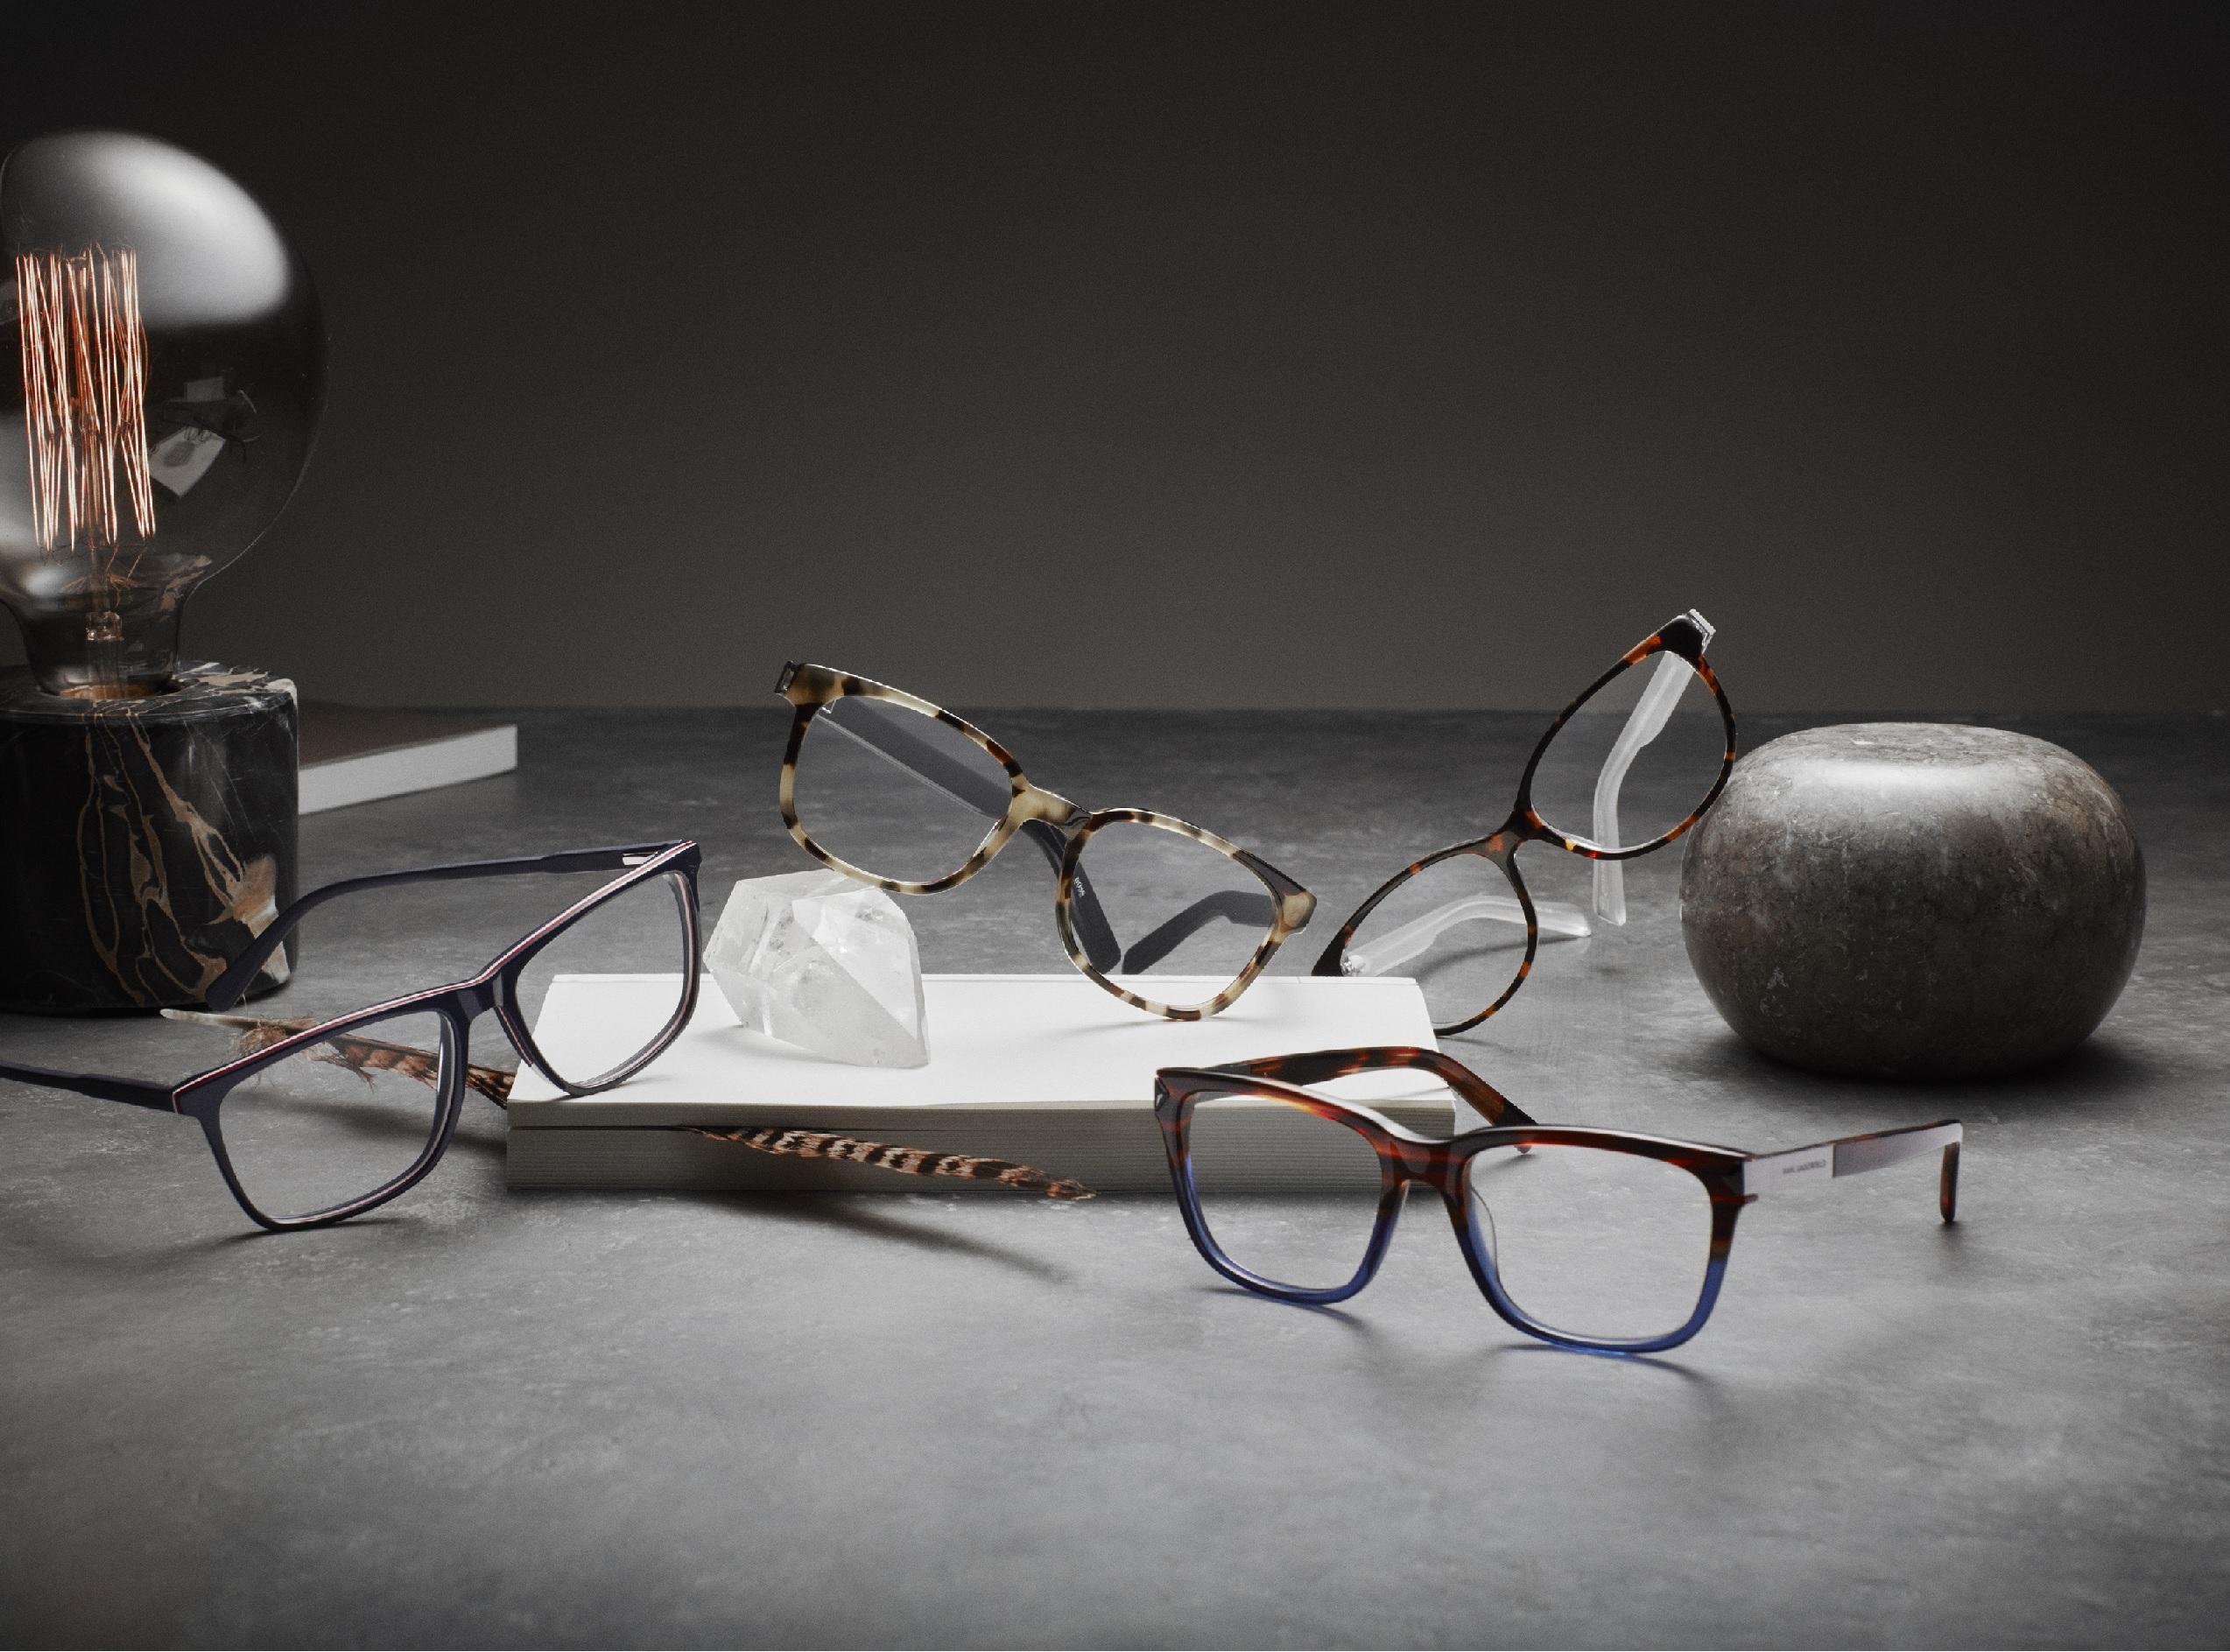 lensway glasögon utan styrka